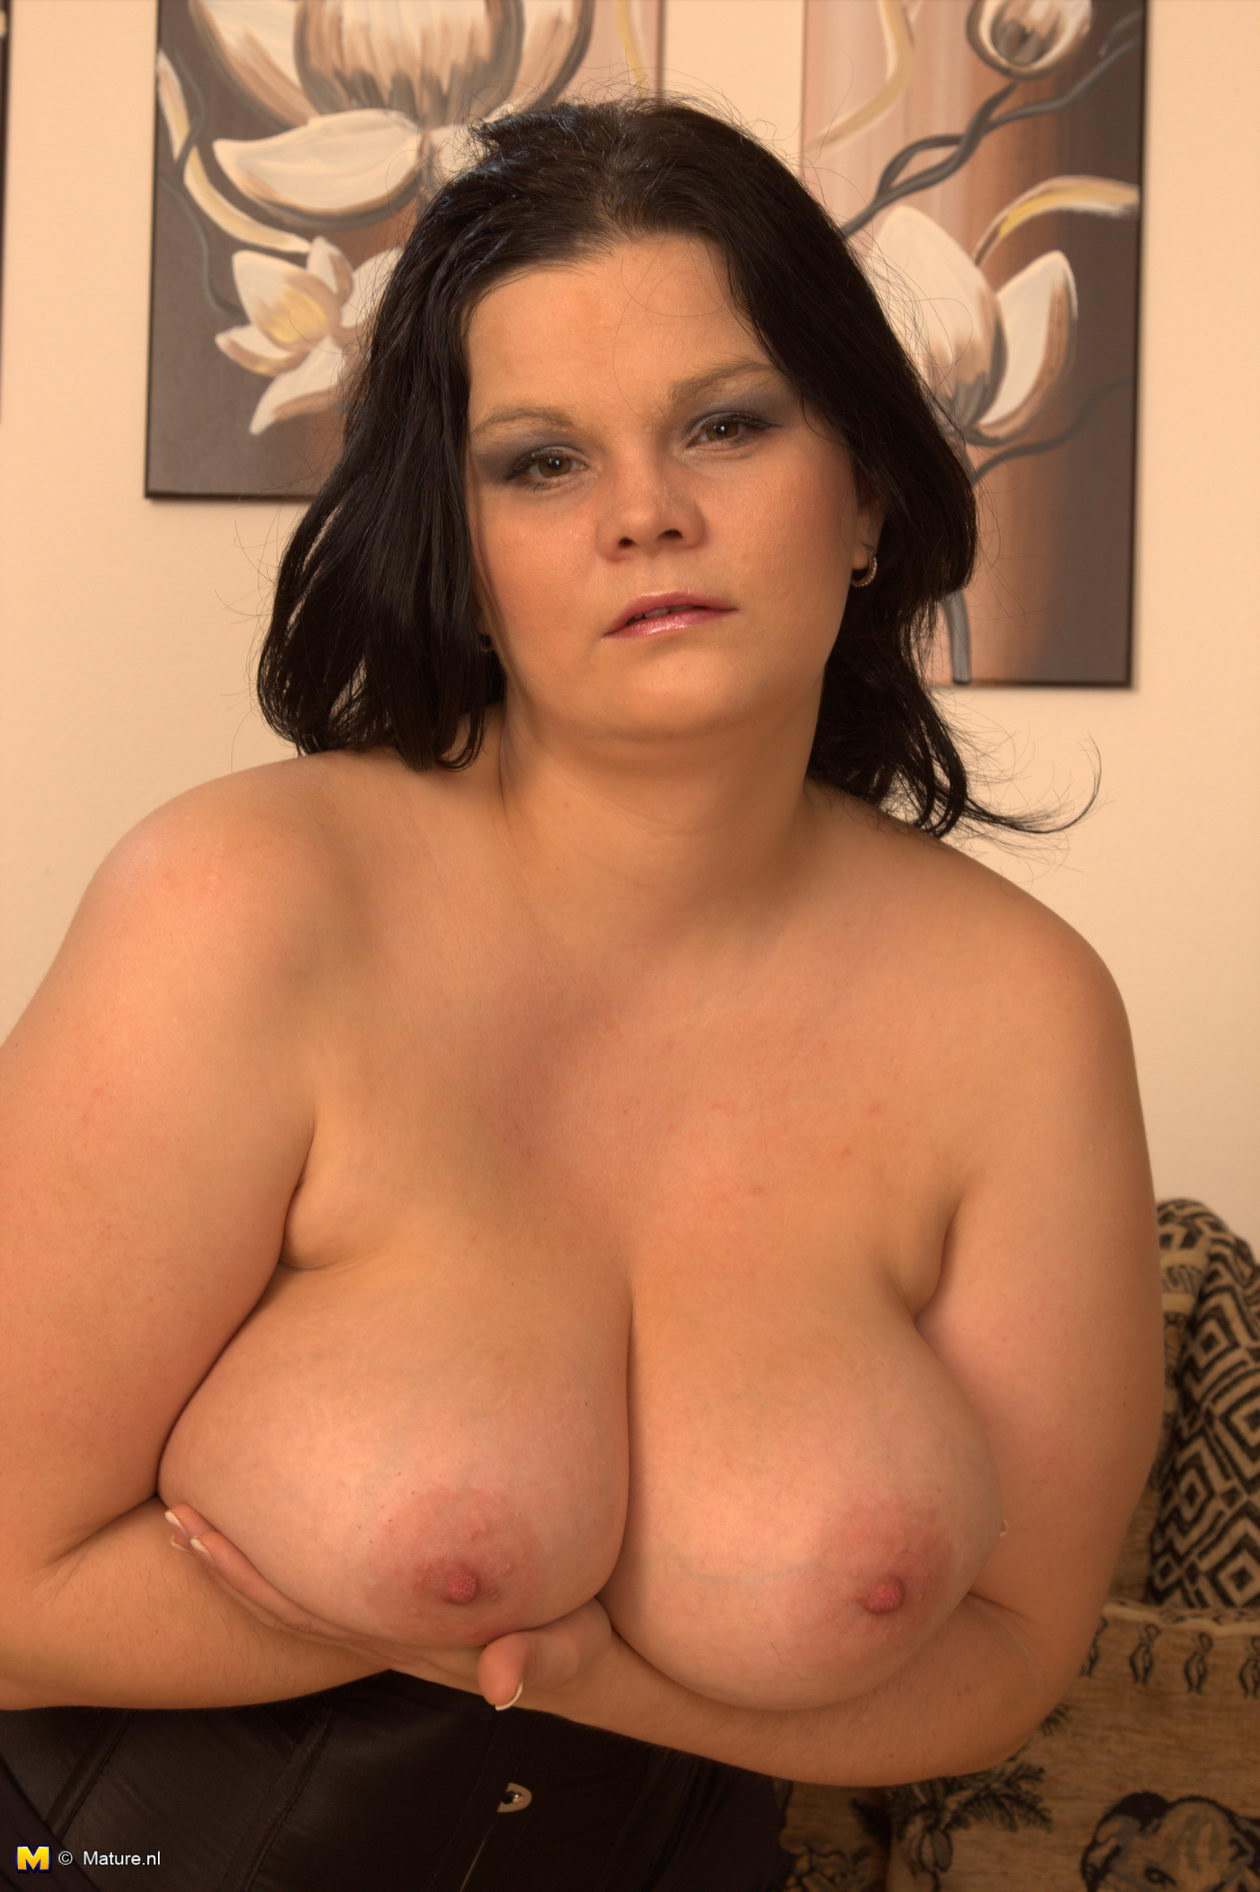 Lovely milf with huge boobs pleasures herself 3